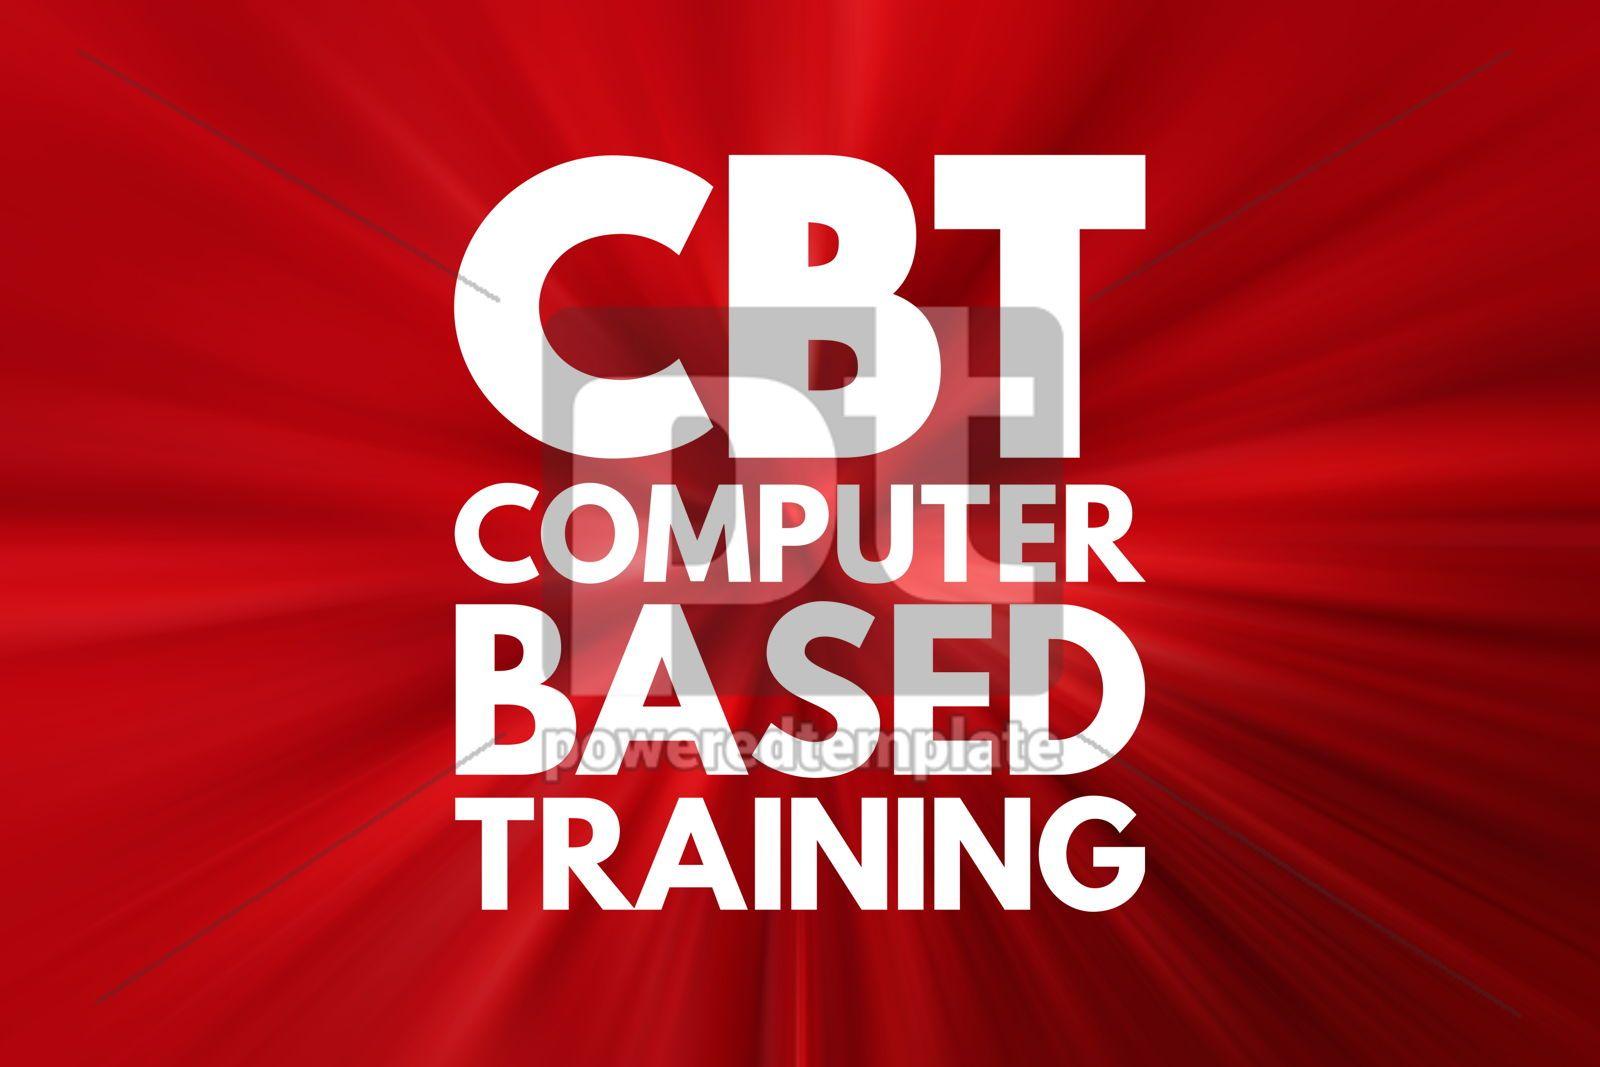 CBT - Computer Based Training acronym education concept backgro, 16522, Business — PoweredTemplate.com